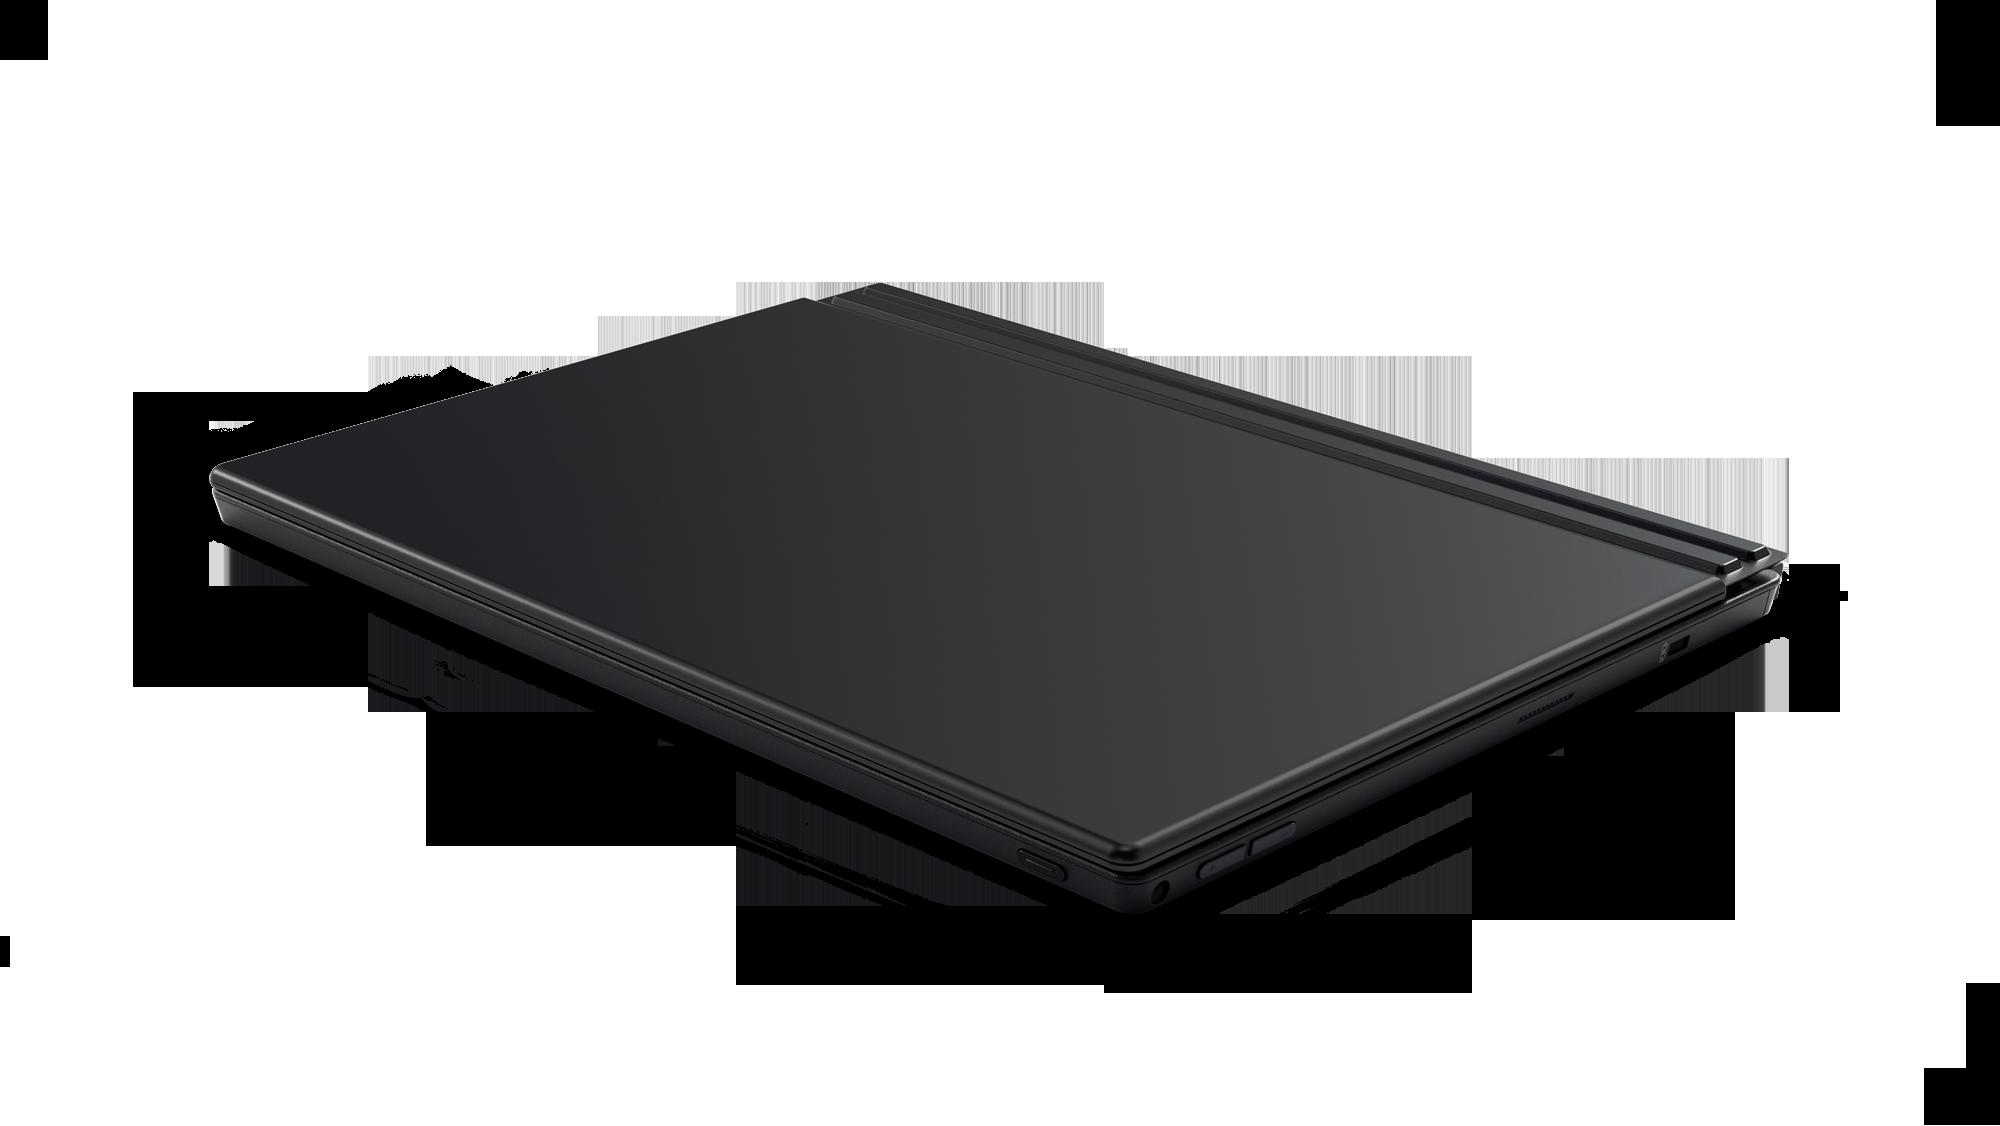 20_X1_Tablet_Base_Black_Thin_Keyboard_Cover_Shot.png